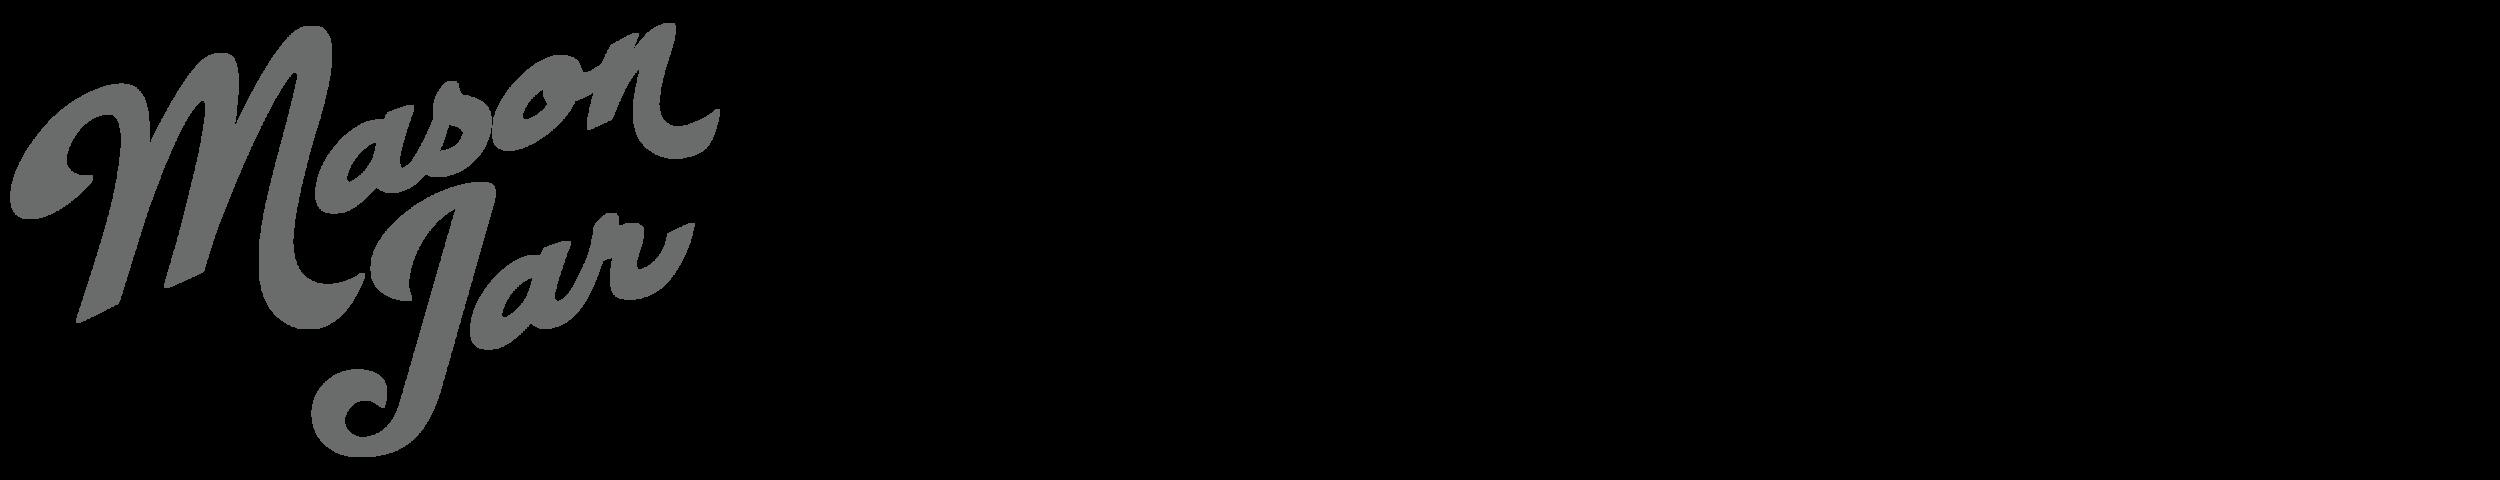 Mason Jar MARKETING LOGO